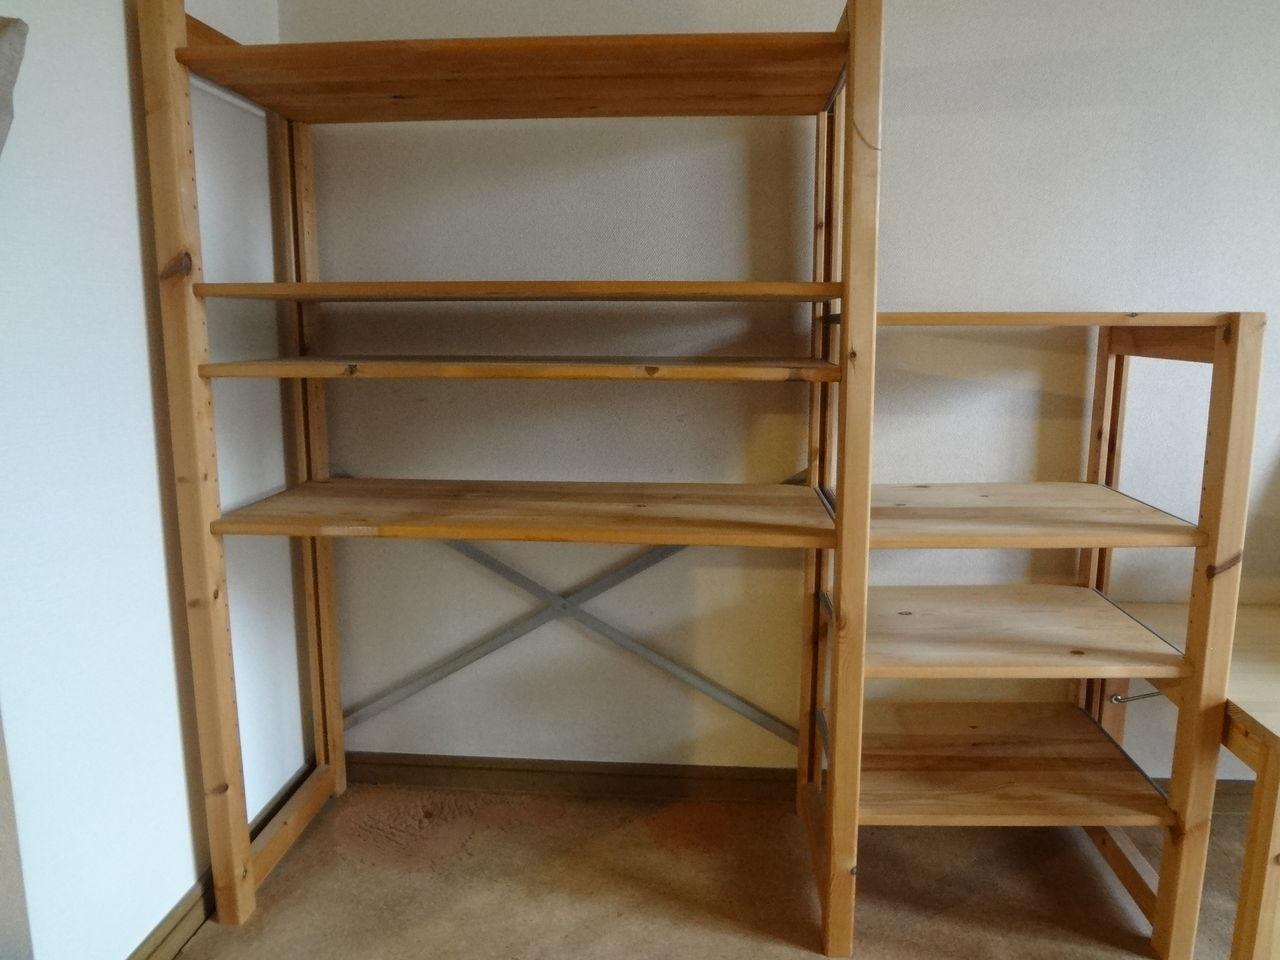 DIY 木材 パインシェルフ 棚板 450 × 150 × 15mm 集成材 ( DIY用